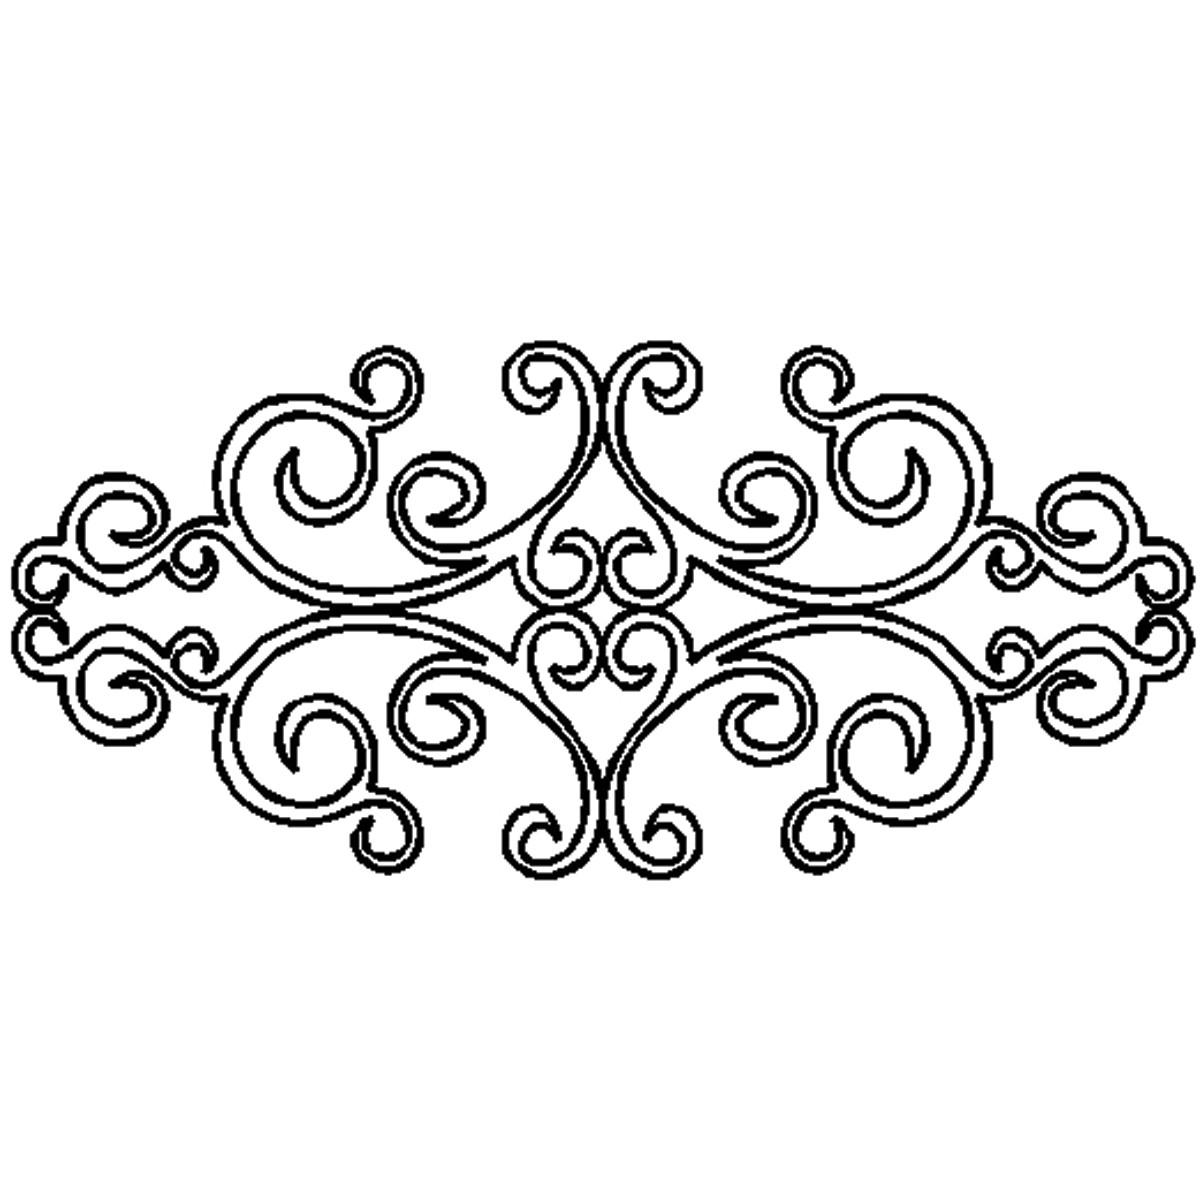 Scroll Stencil Patterns ClipArt Best